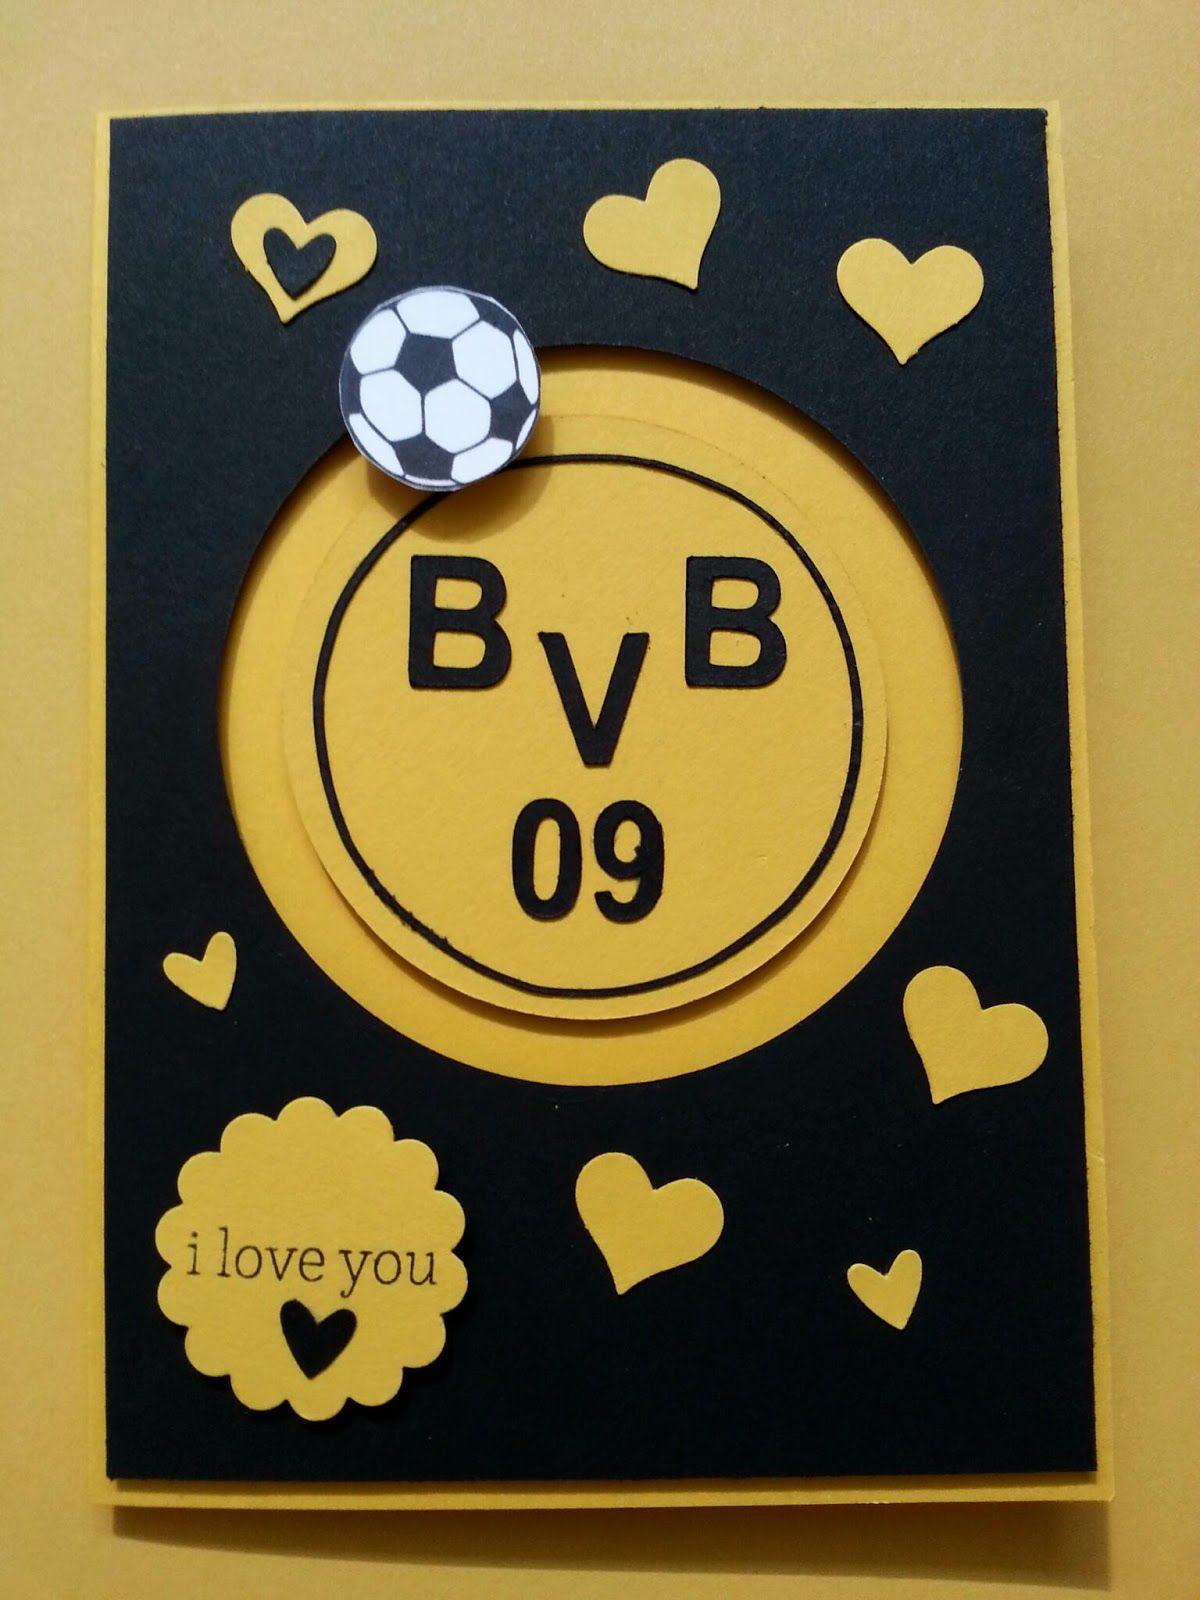 Bvb-Kullerkarte | Karten, Geburtstagskarte, Bvb Geschenk mit Bvb Geburtstagskarte